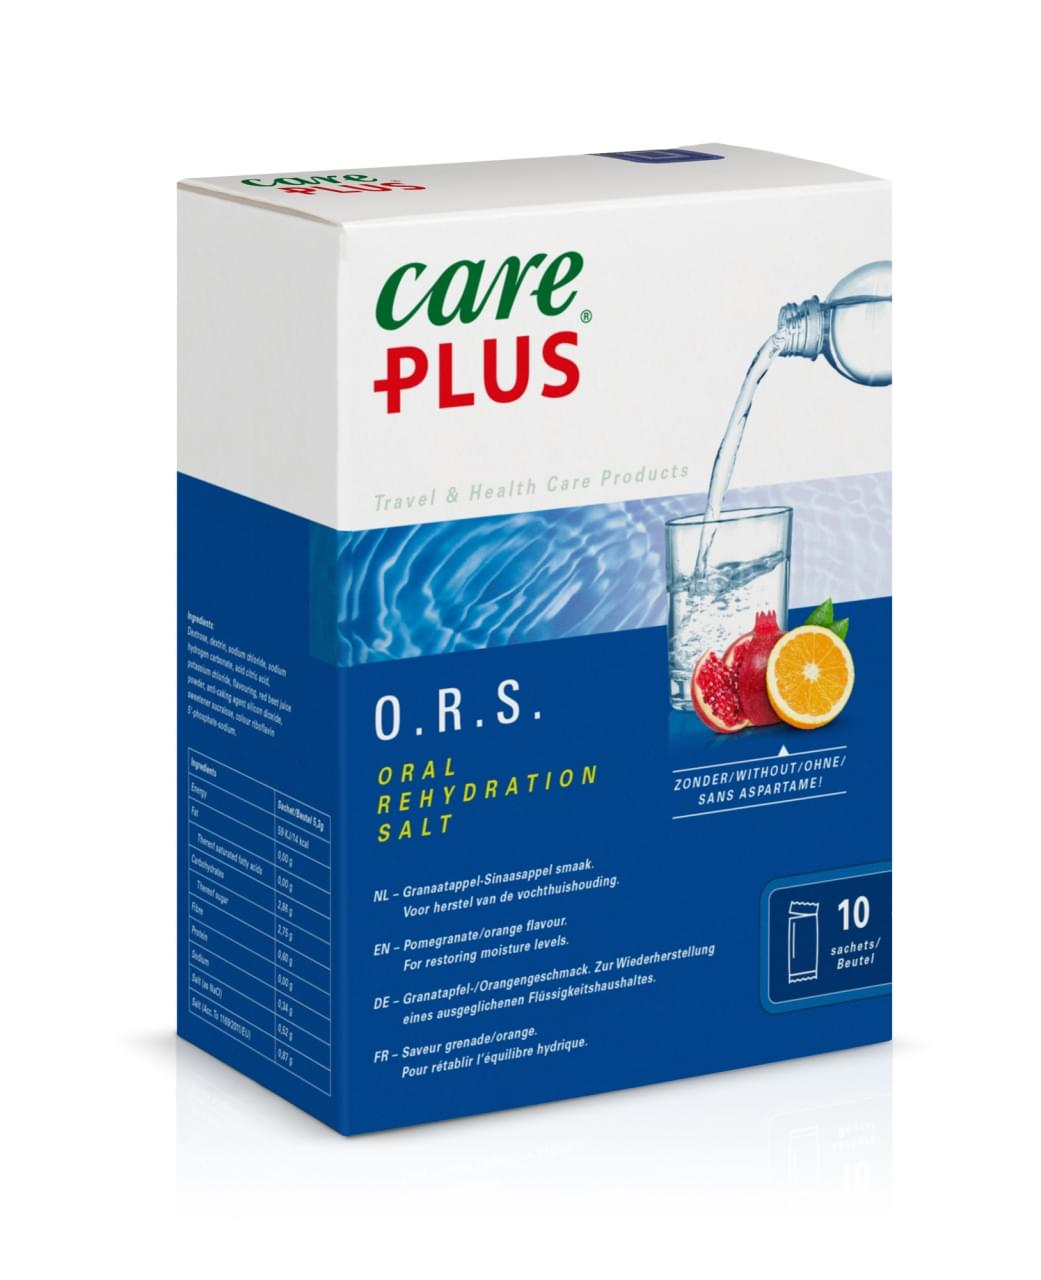 Care Plus O.R.S. - Oral Rehydration Salt